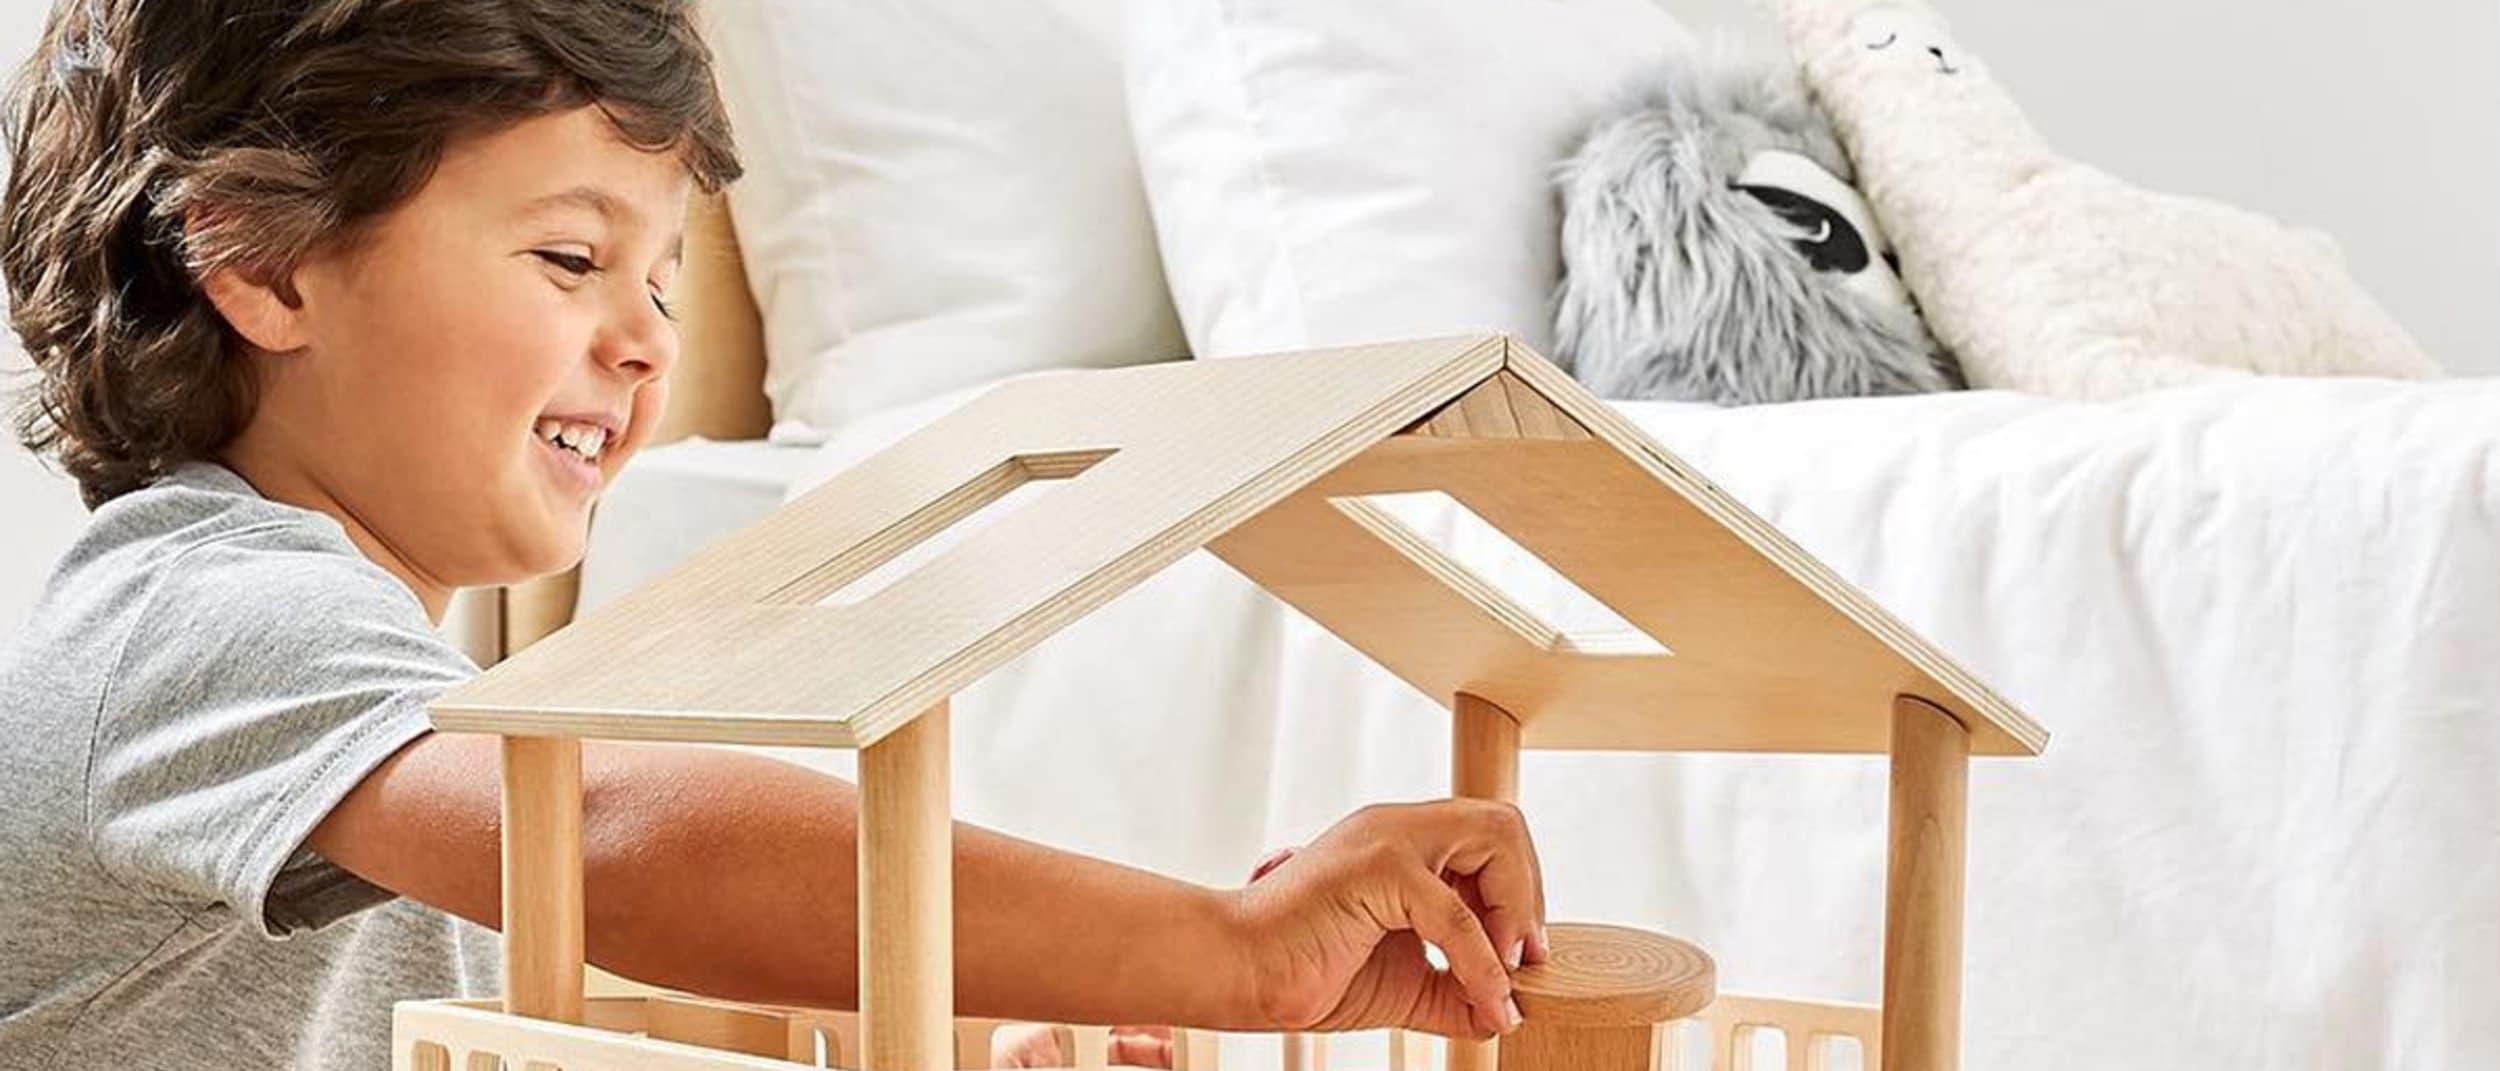 Kids bedroom inspiration from Kmart